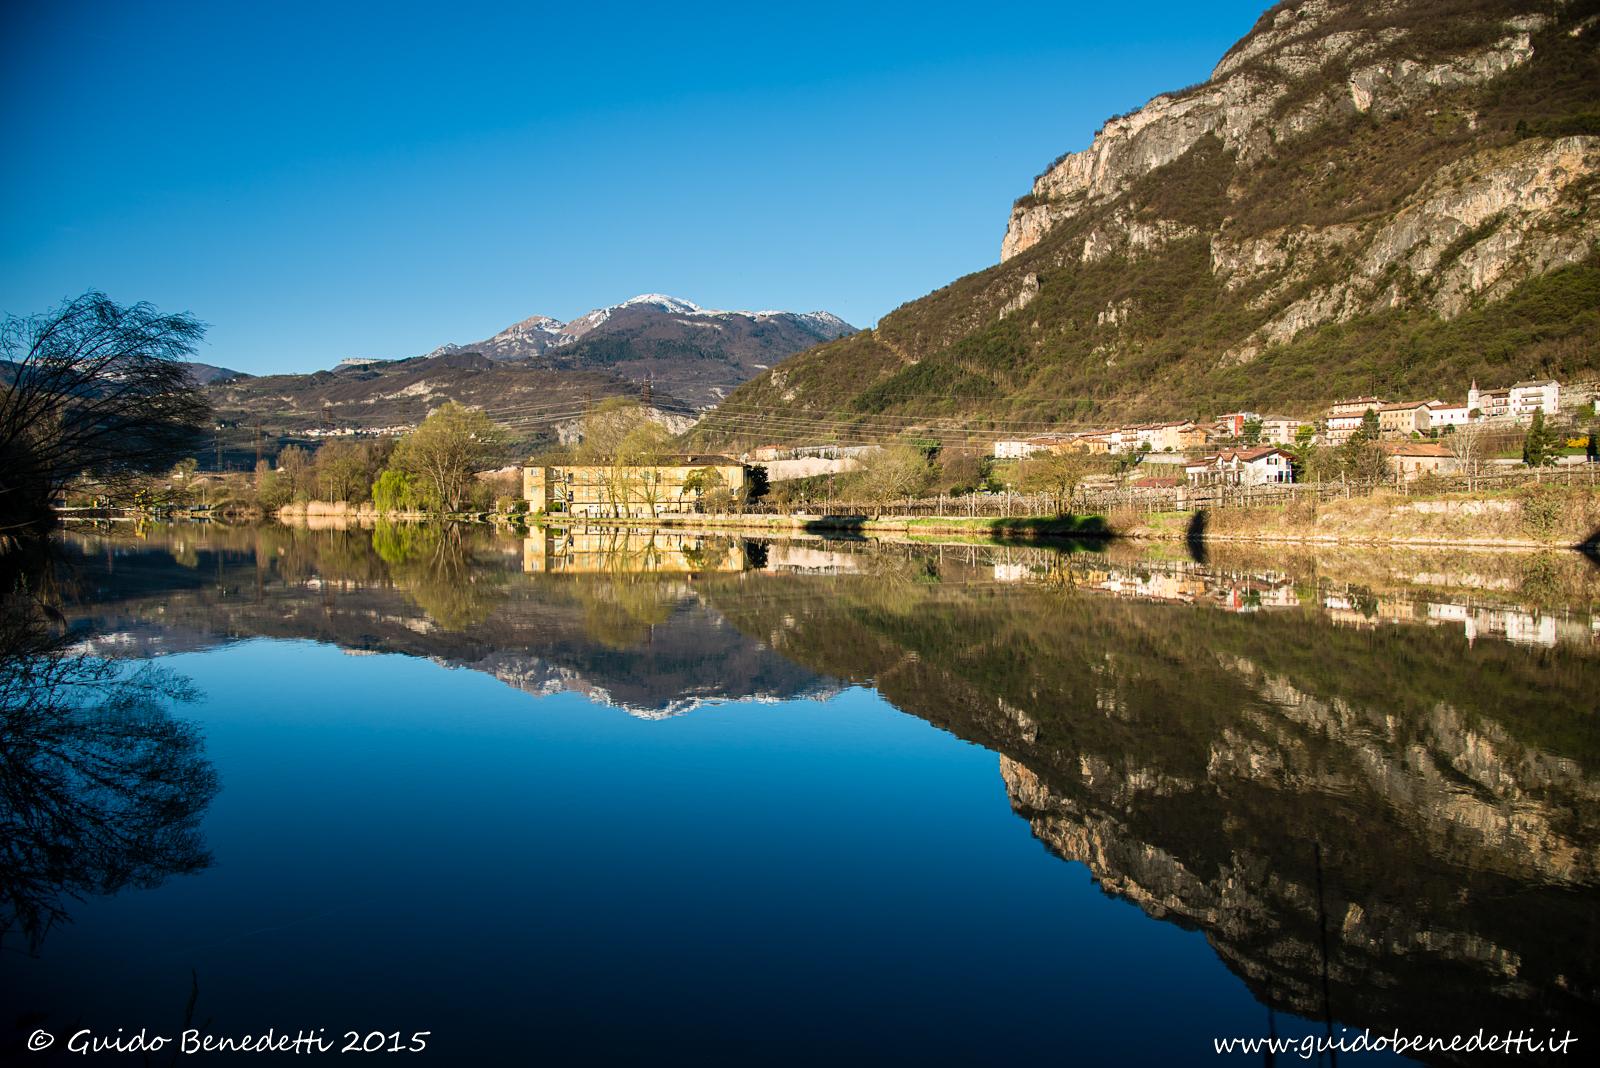 Una mattina in riva all'Adige…